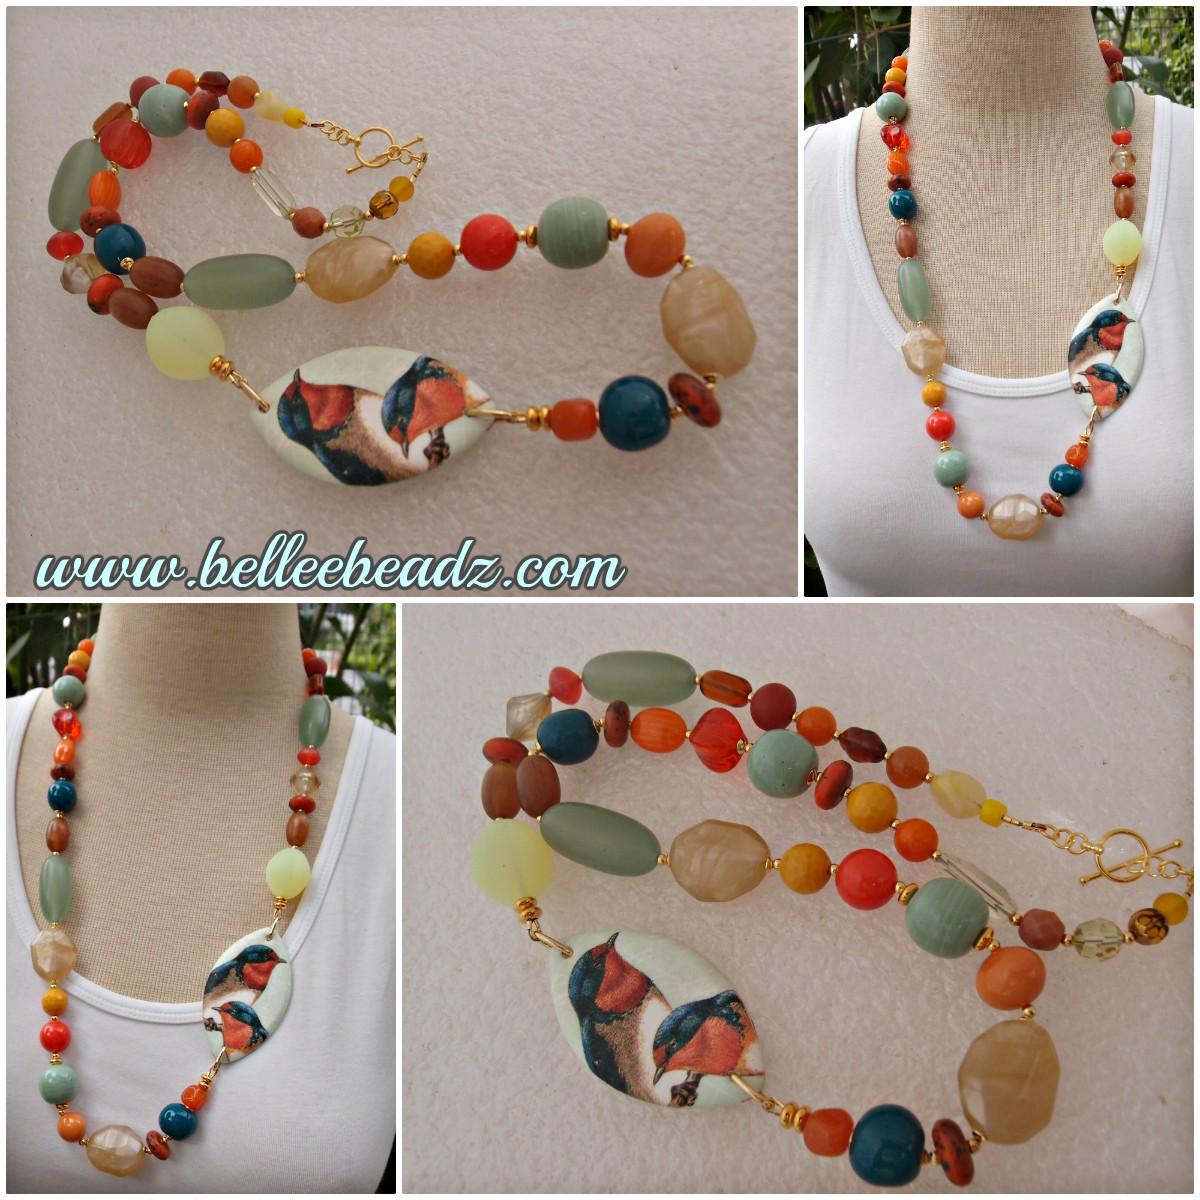 17 beads 12mm Indigo Rustic Glass Pearl Bead approx